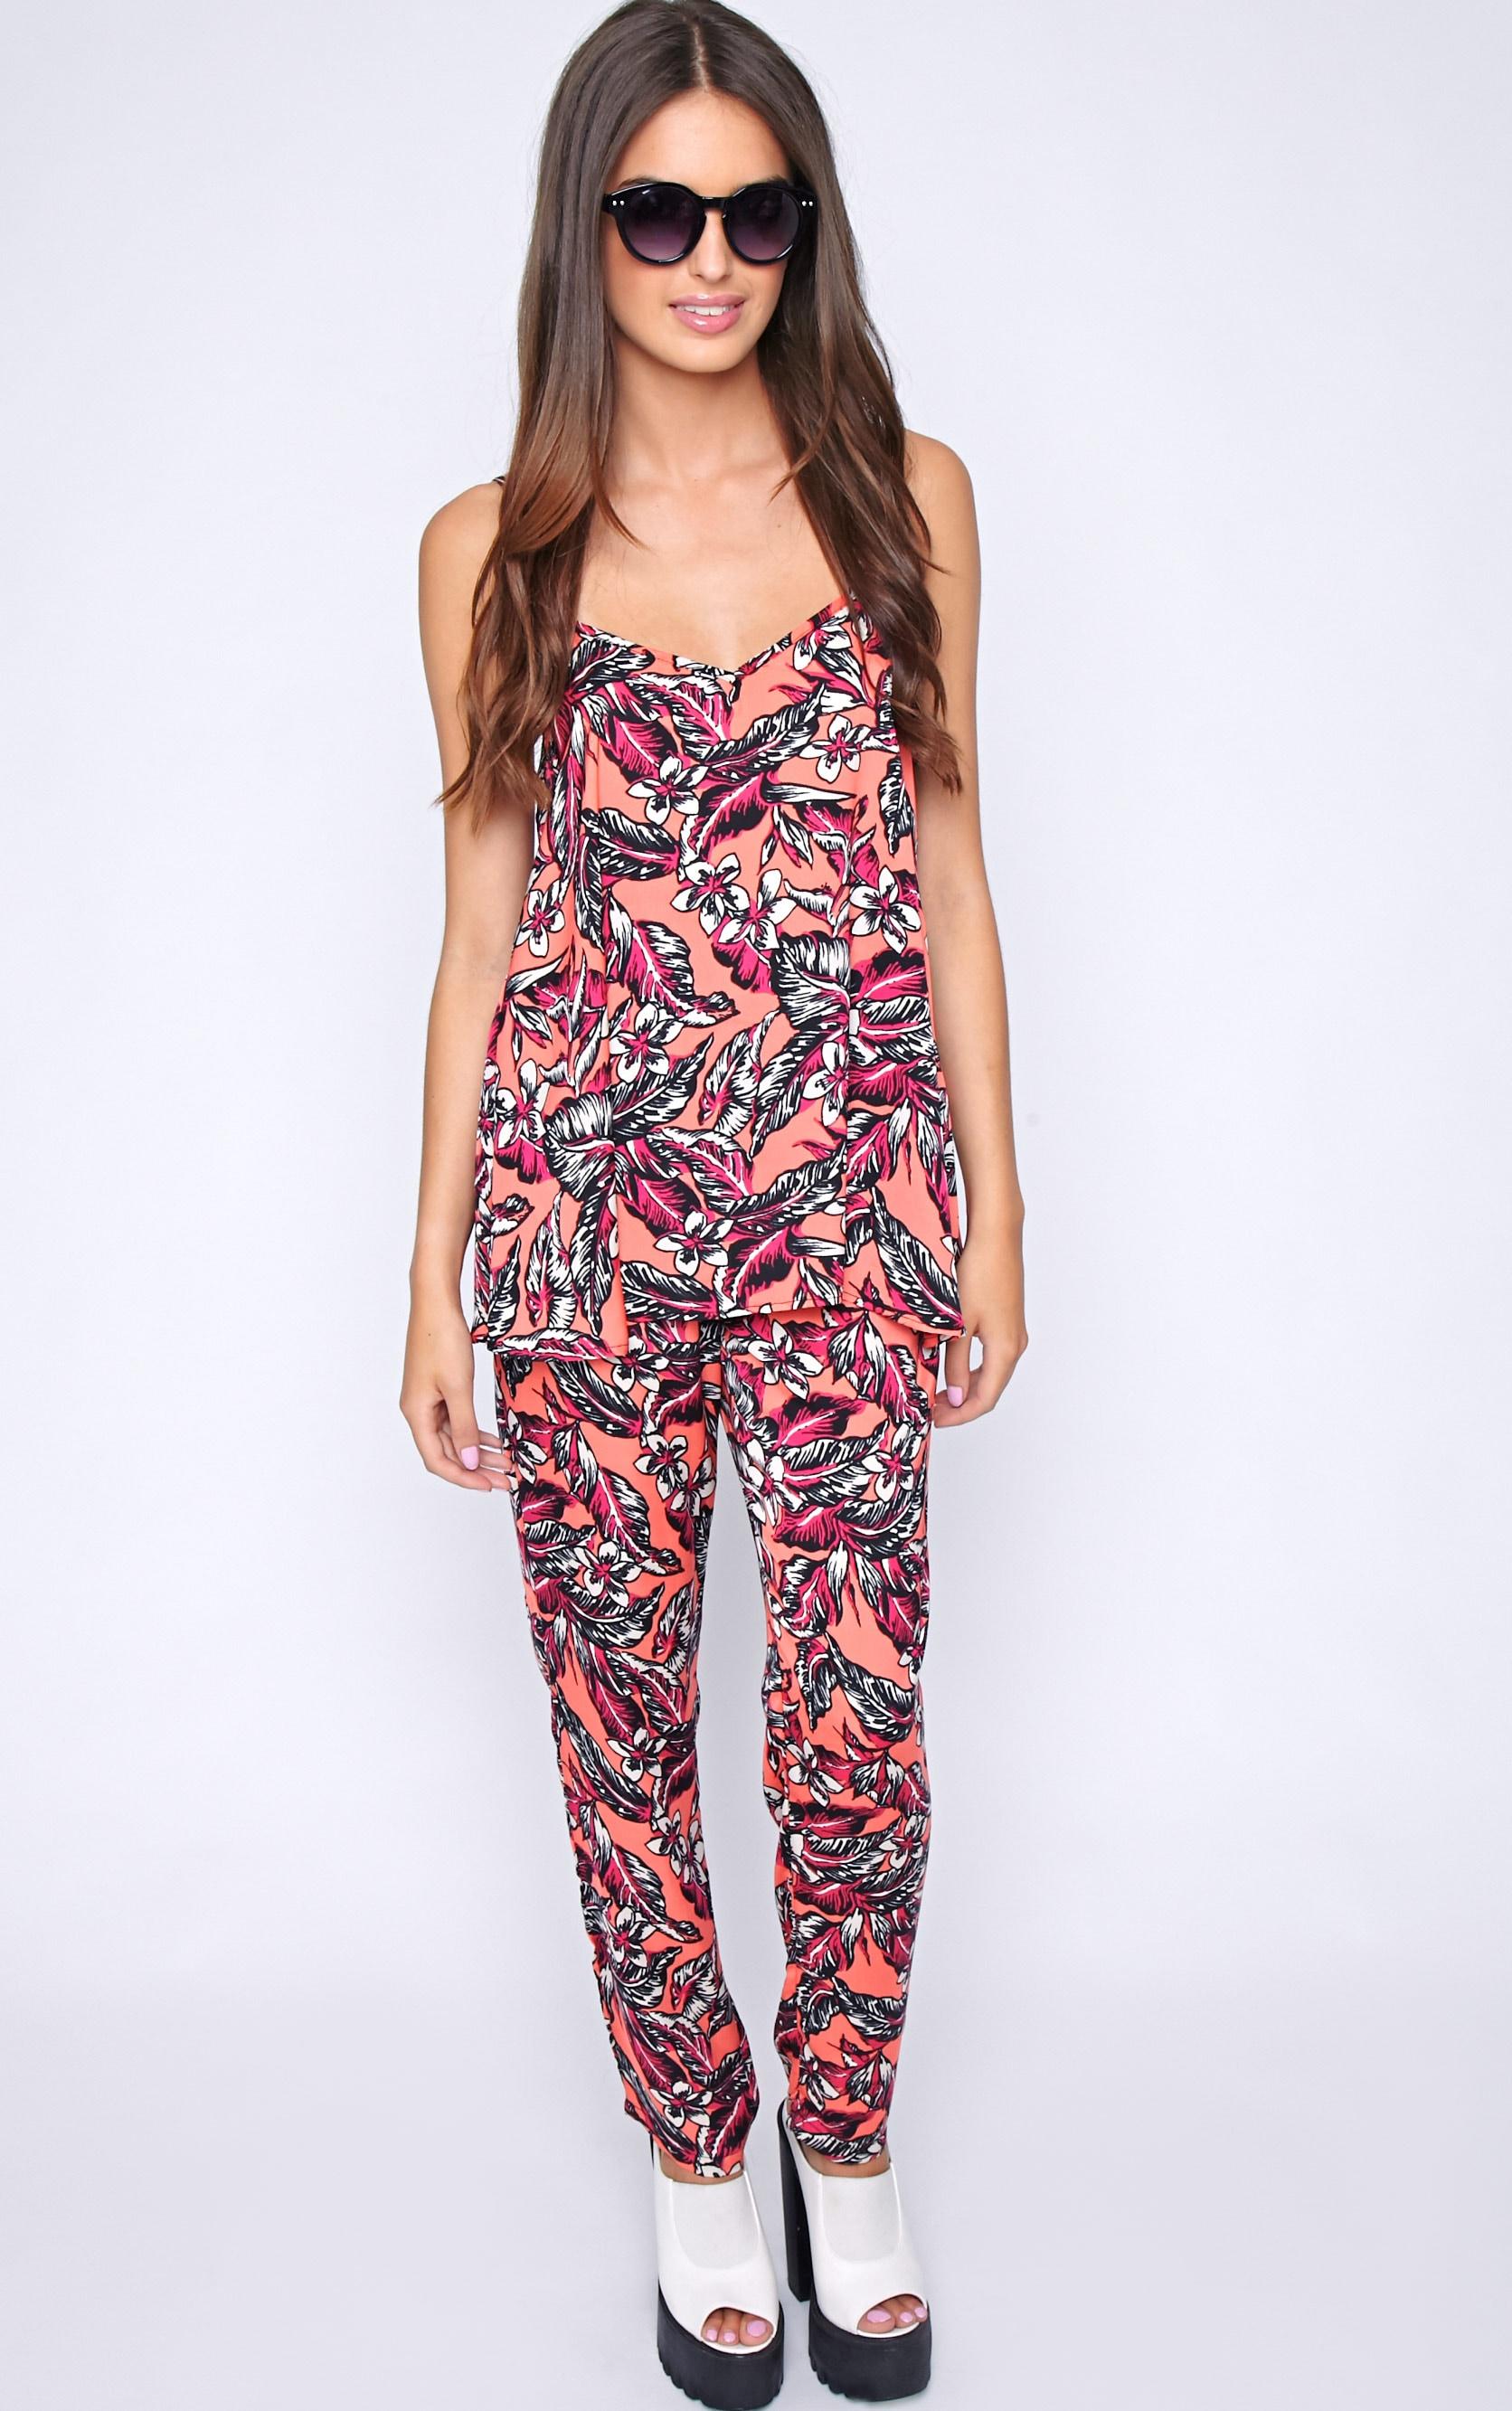 Annabelle Coral Floral Print Trouser 4